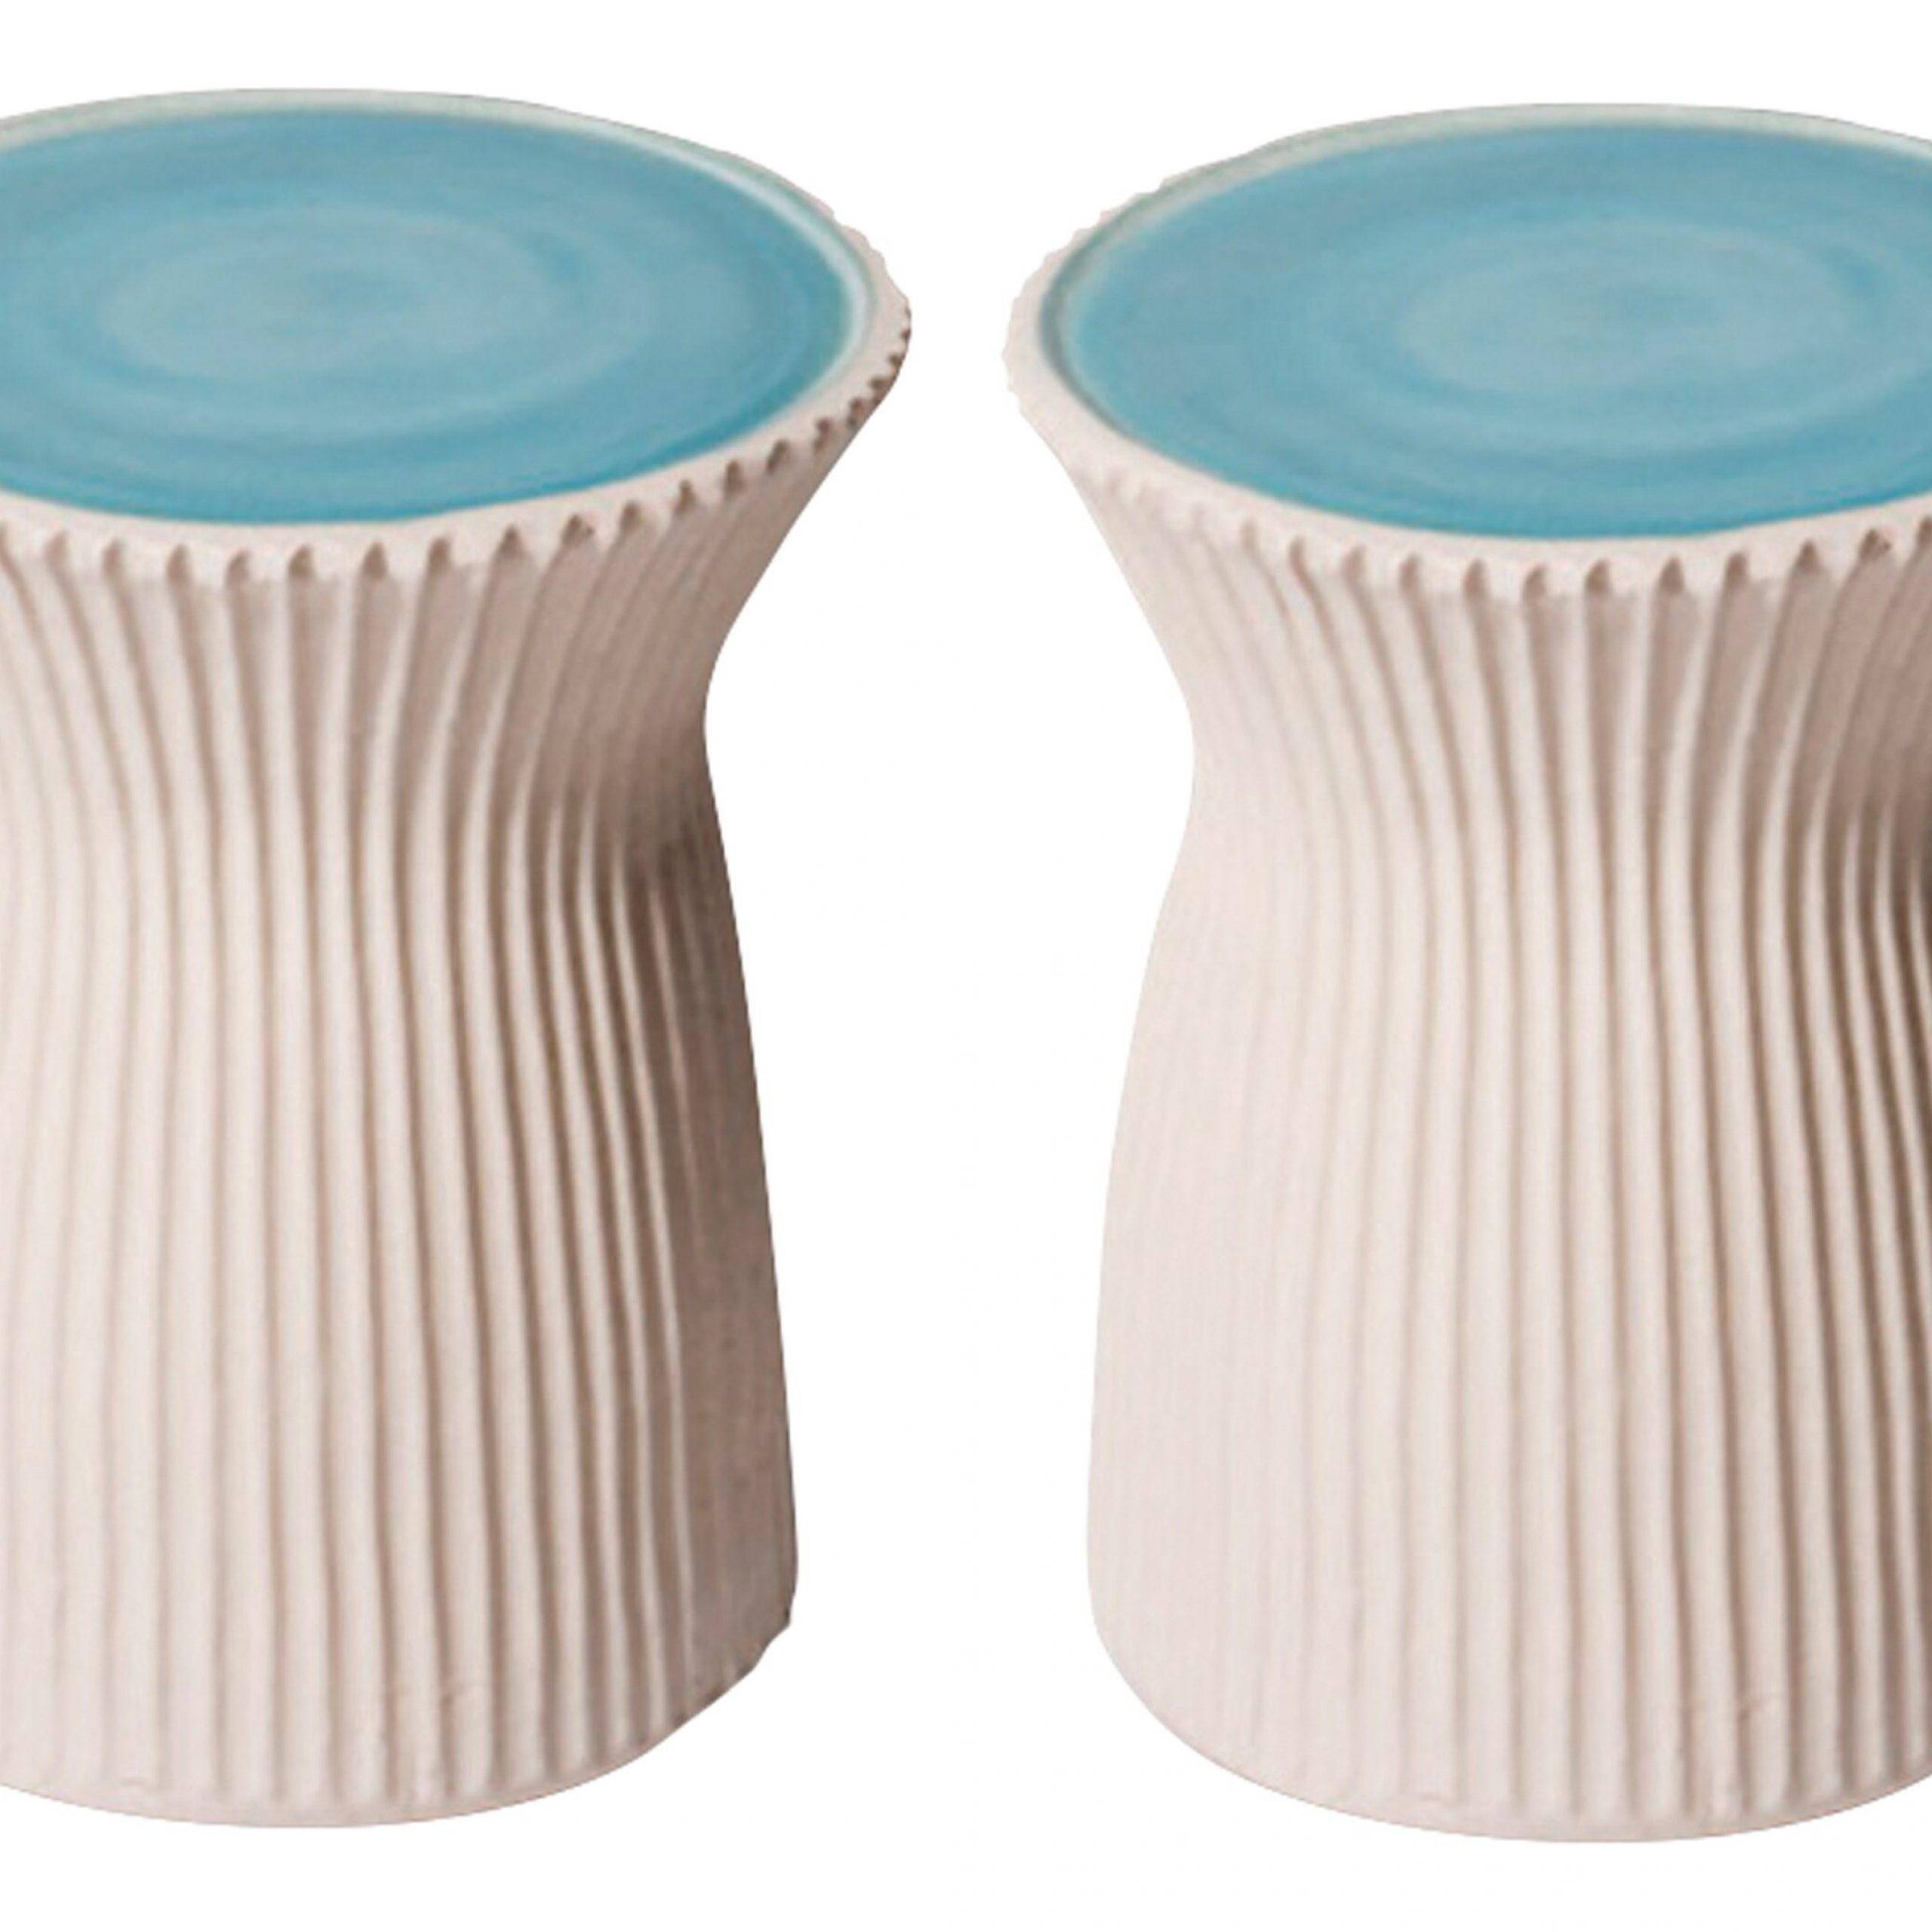 Ceramic Garden Stool With Aloysius Ceramic Garden Stools (View 3 of 25)